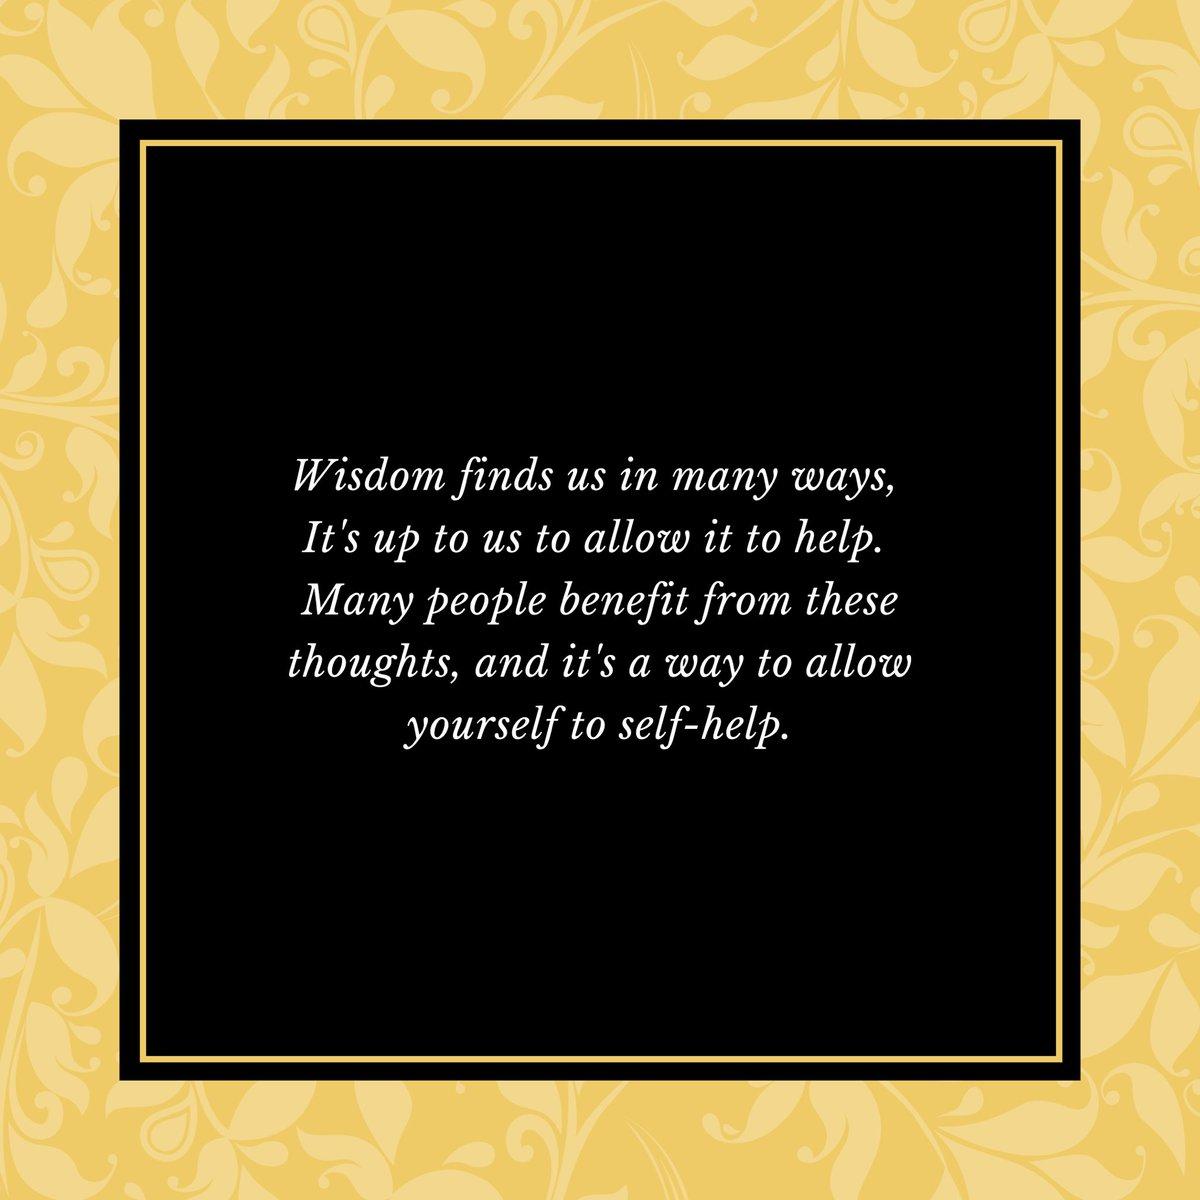 Happy Wednesday!  #inspiringquotes #WisdomWednesday<br>http://pic.twitter.com/hEio91xylL